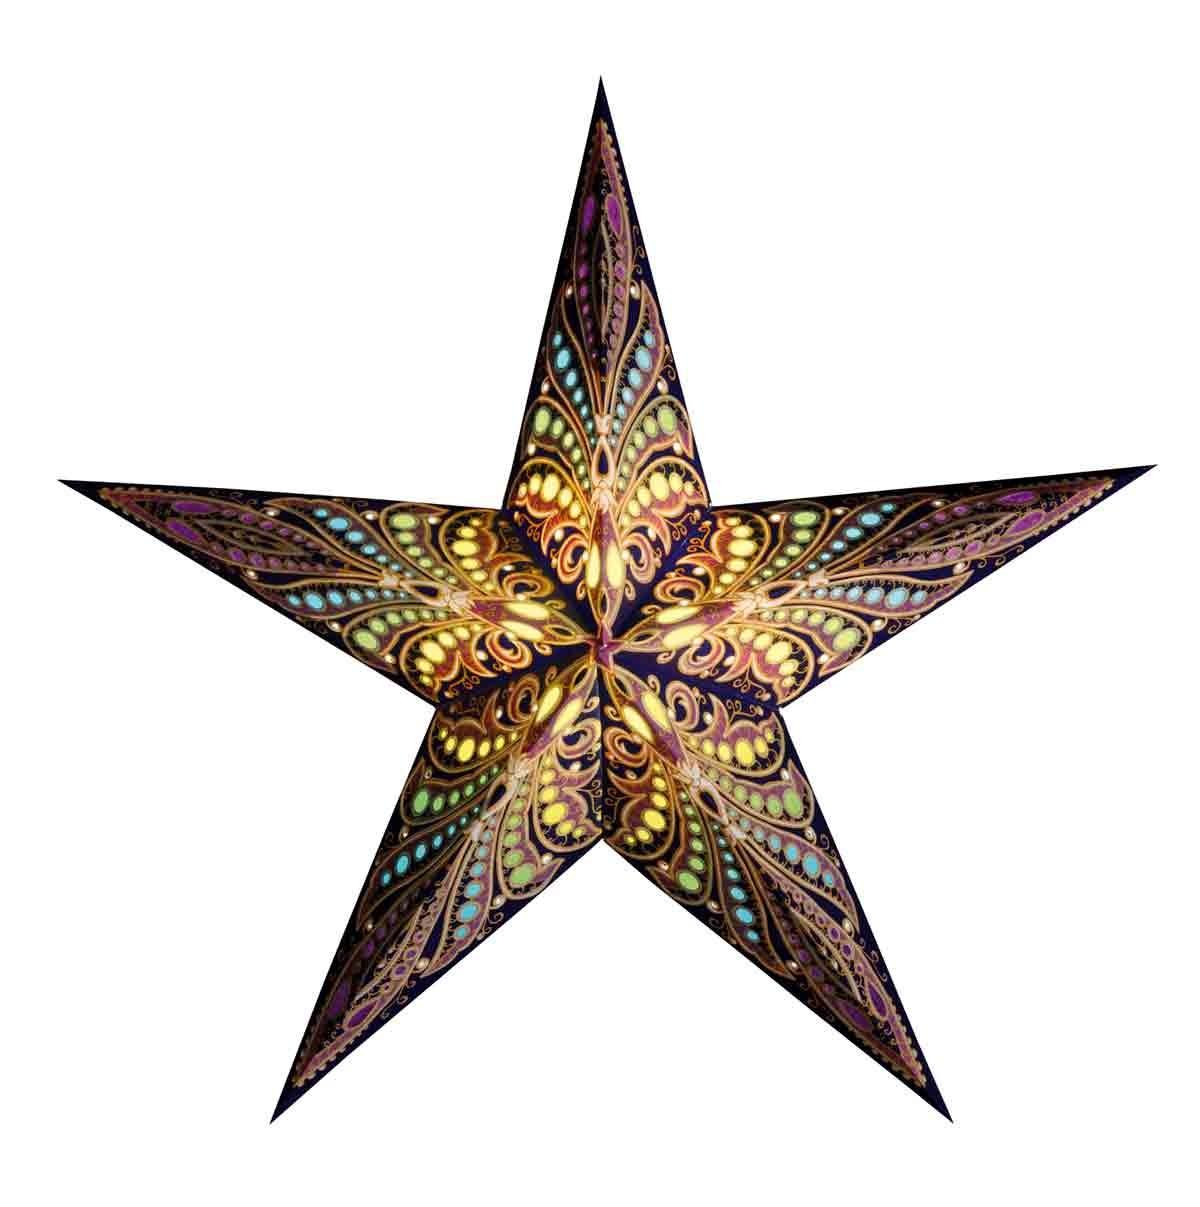 starlightz queen of tahiti - size M